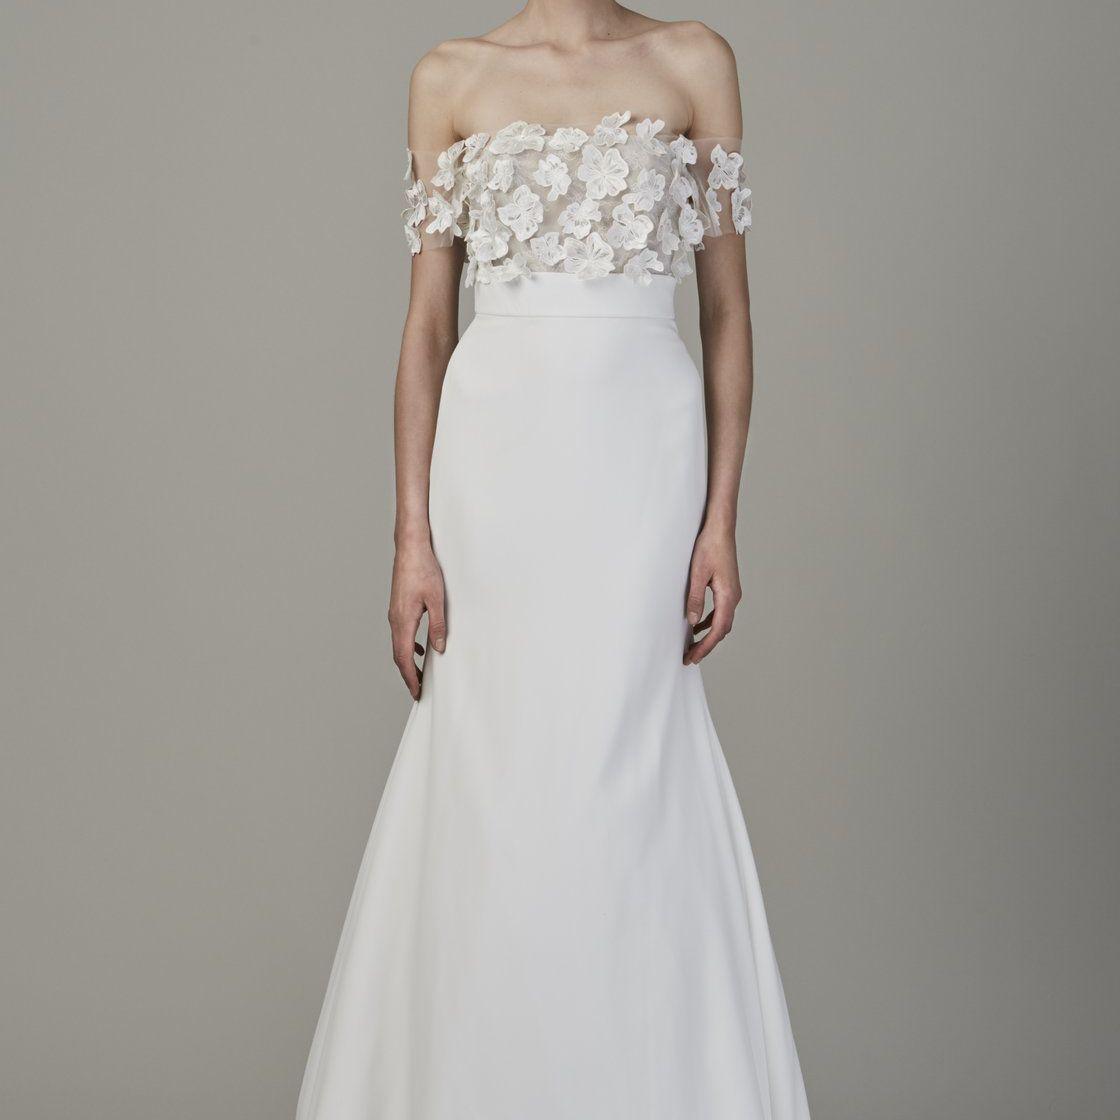 Model in Off the Shoulder Floral Applique Gown